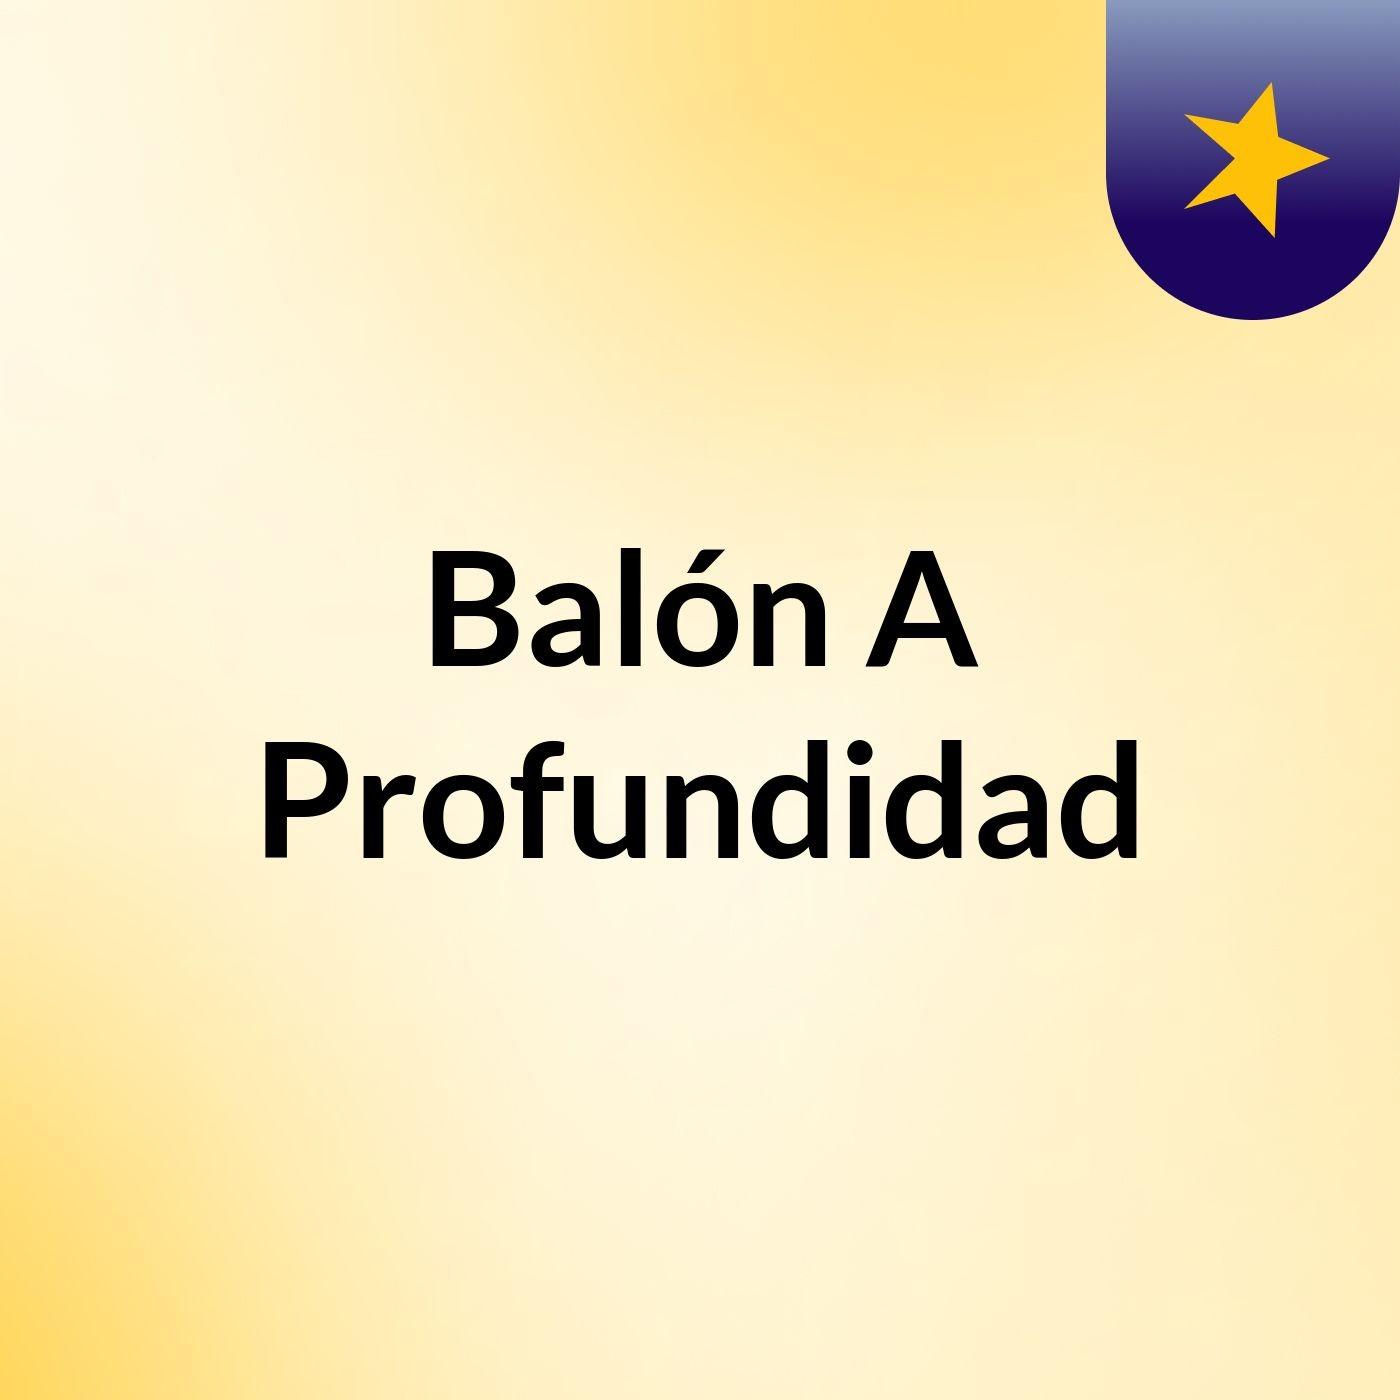 Episodio 5 - Balón A Profundidad Jornada 4 (Parte 2)